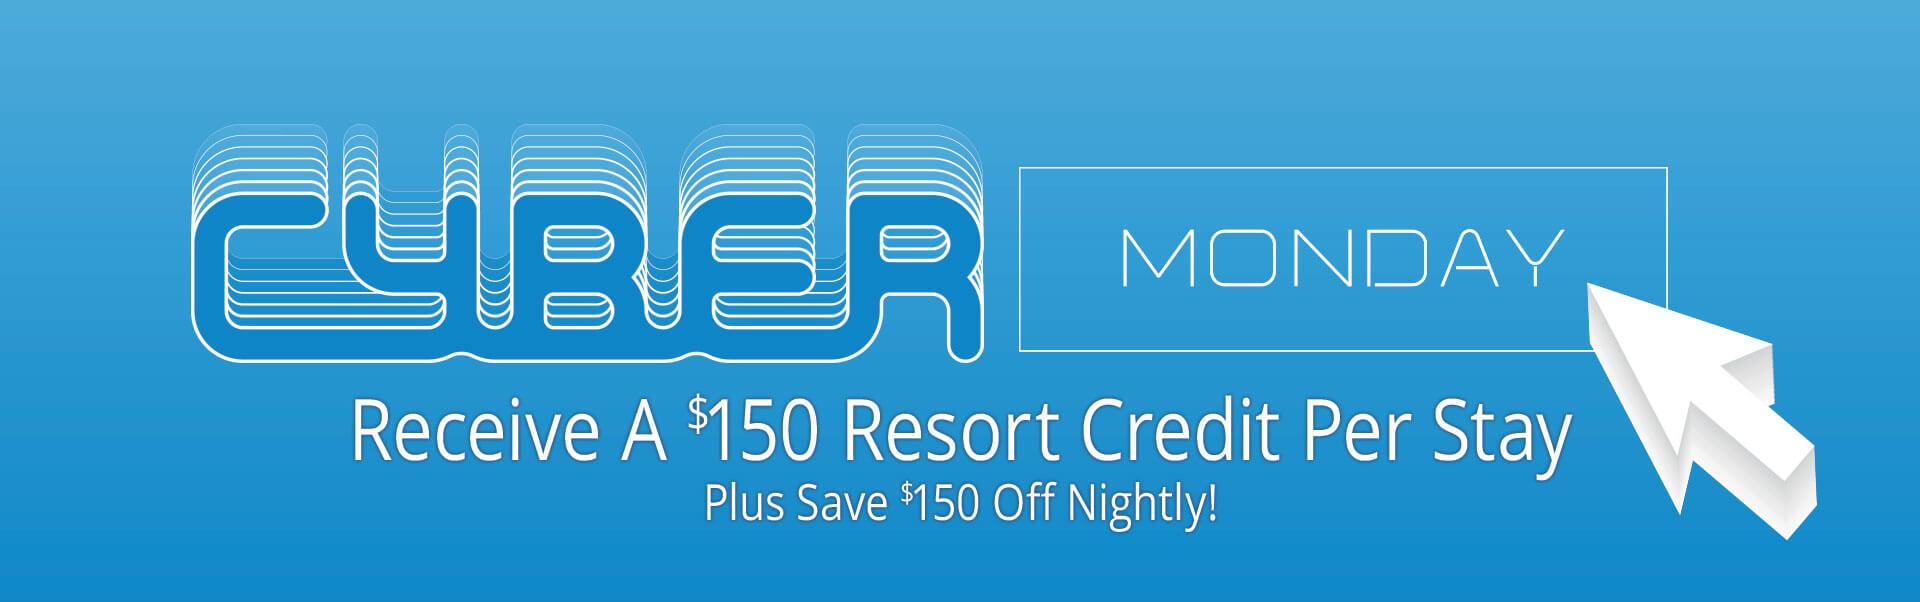 Mount olympus awards coupon